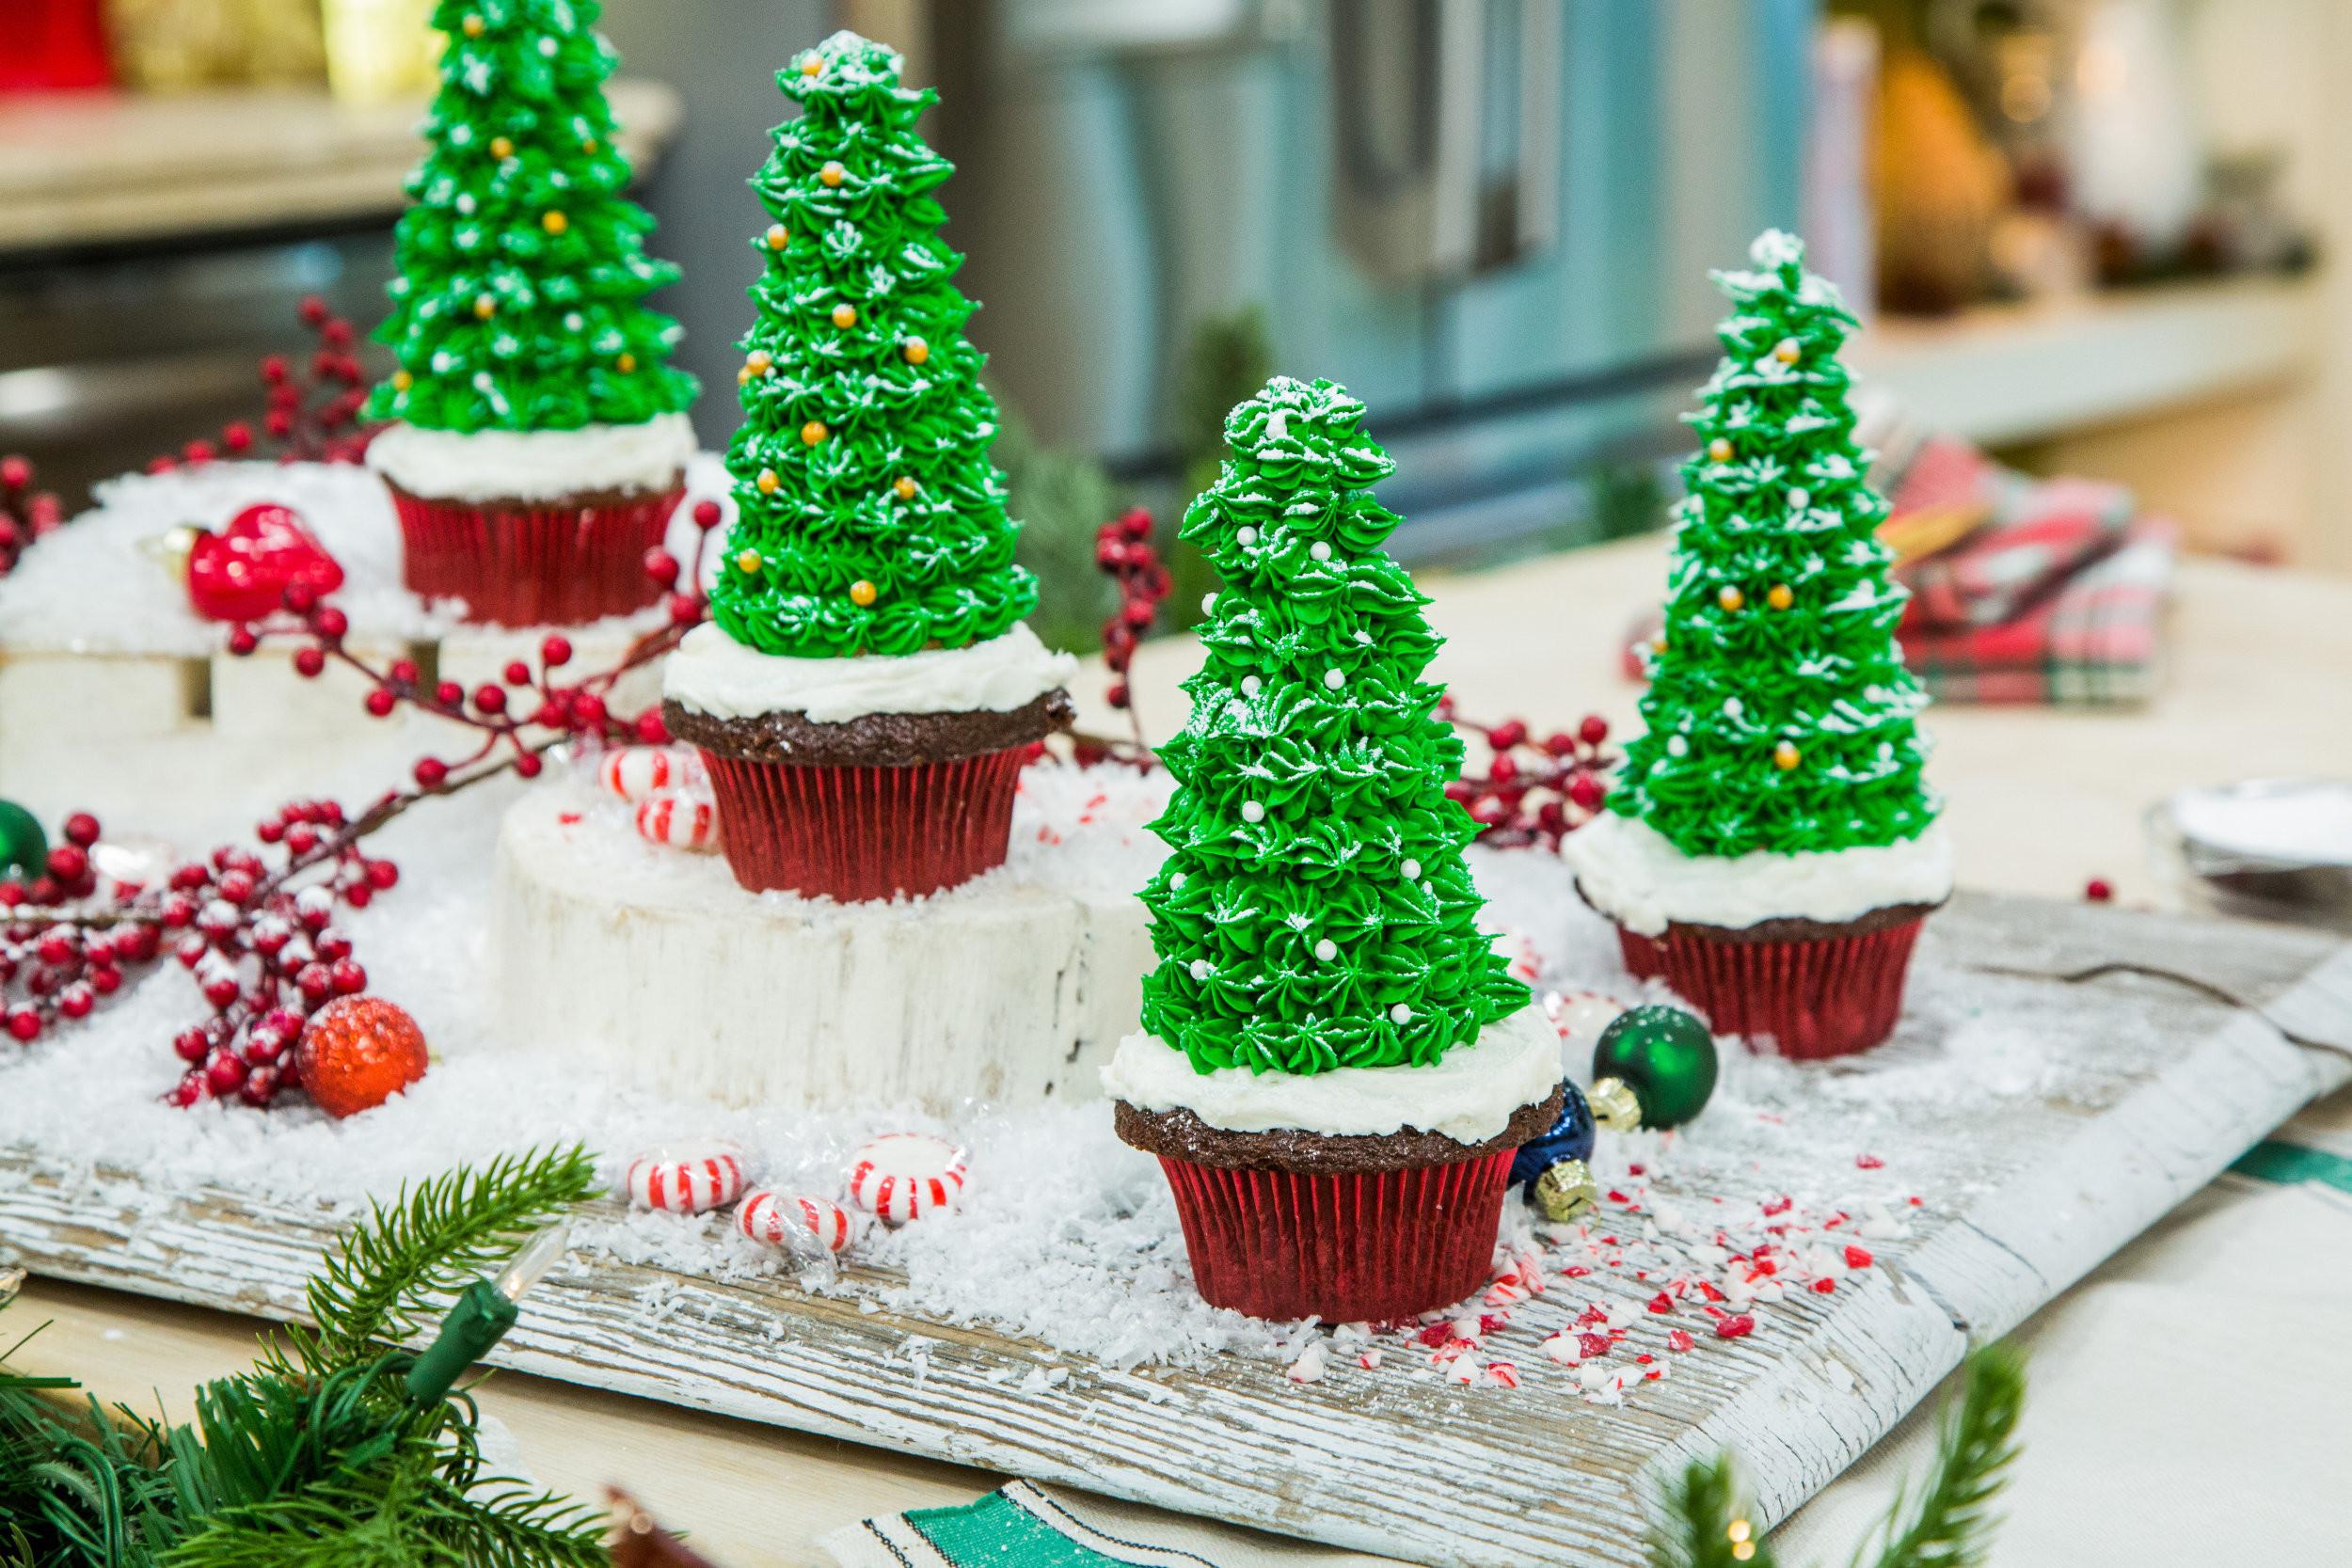 Christmas Tree Cupcakes  Christmas Tree Cupcakes Home & Family